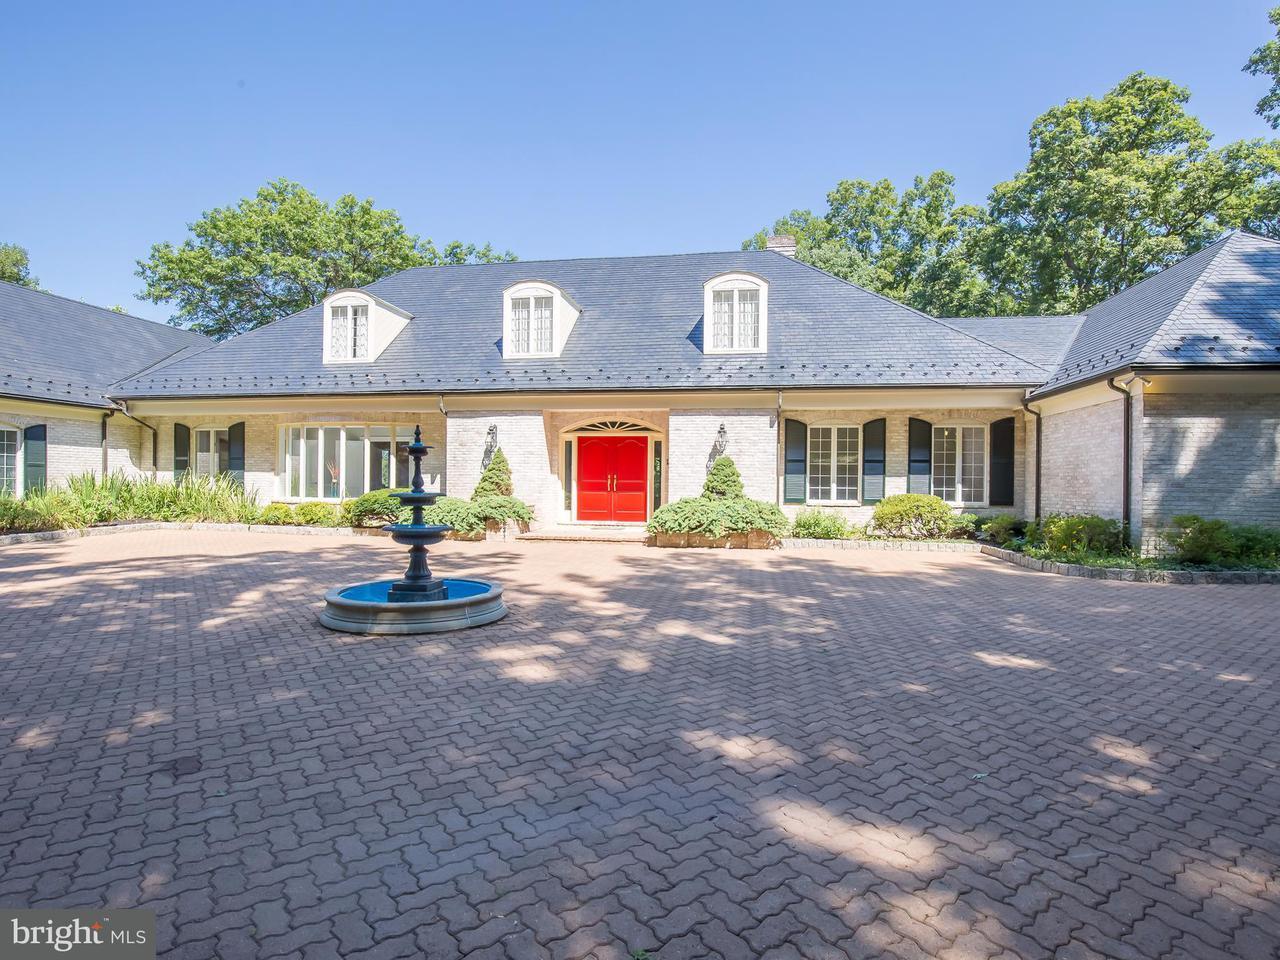 Single Family Home for Sale at 730 ZEUSWYN Drive 730 ZEUSWYN Drive Culpeper, Virginia 22701 United States